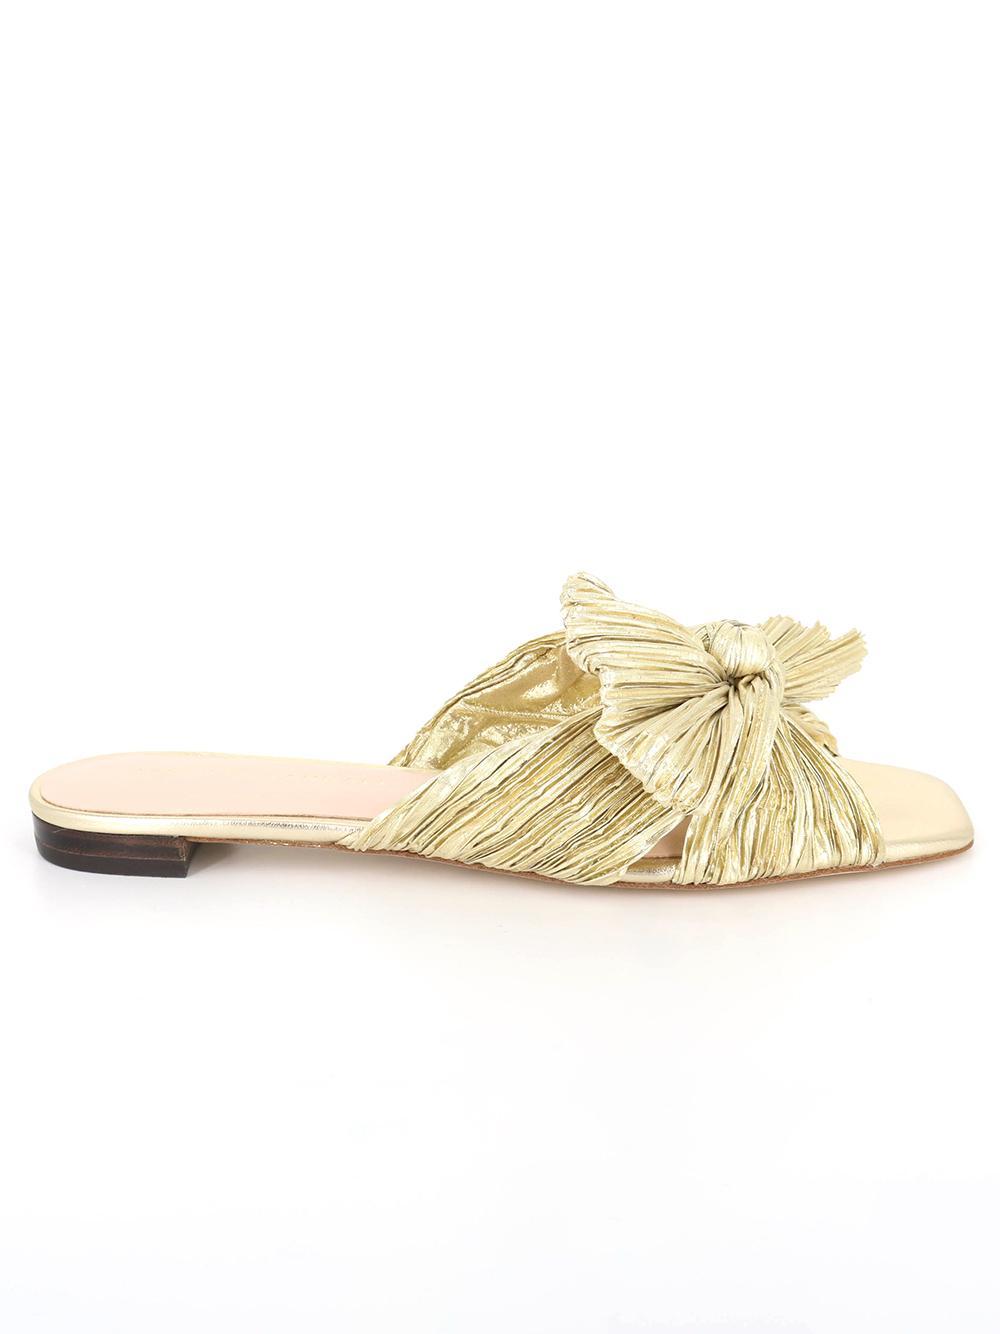 Daphne Knot Flat Sandal